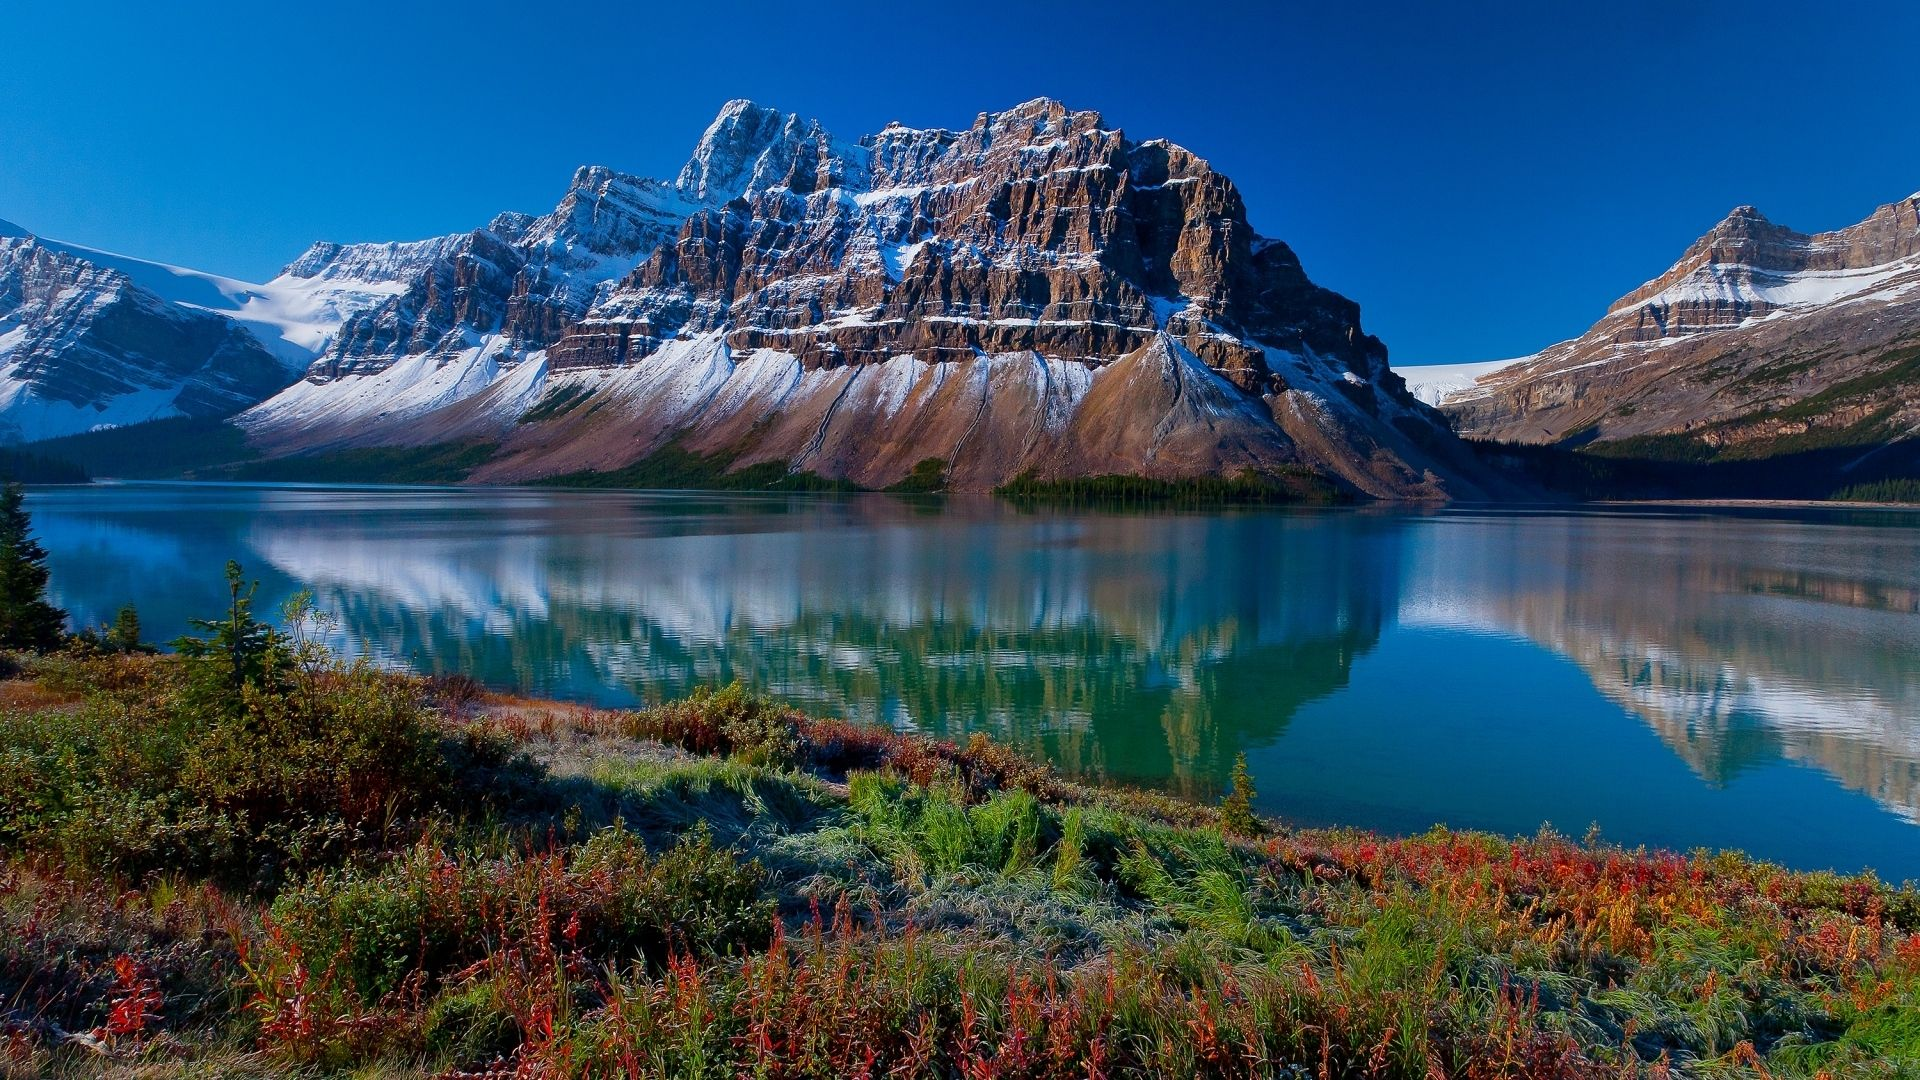 10 Best Beautiful Landscape Wallpaper 1080p Full Hd 1080p For Pc Background Beautiful Landscape Wallpaper Beautiful Landscapes Landscape Wallpaper